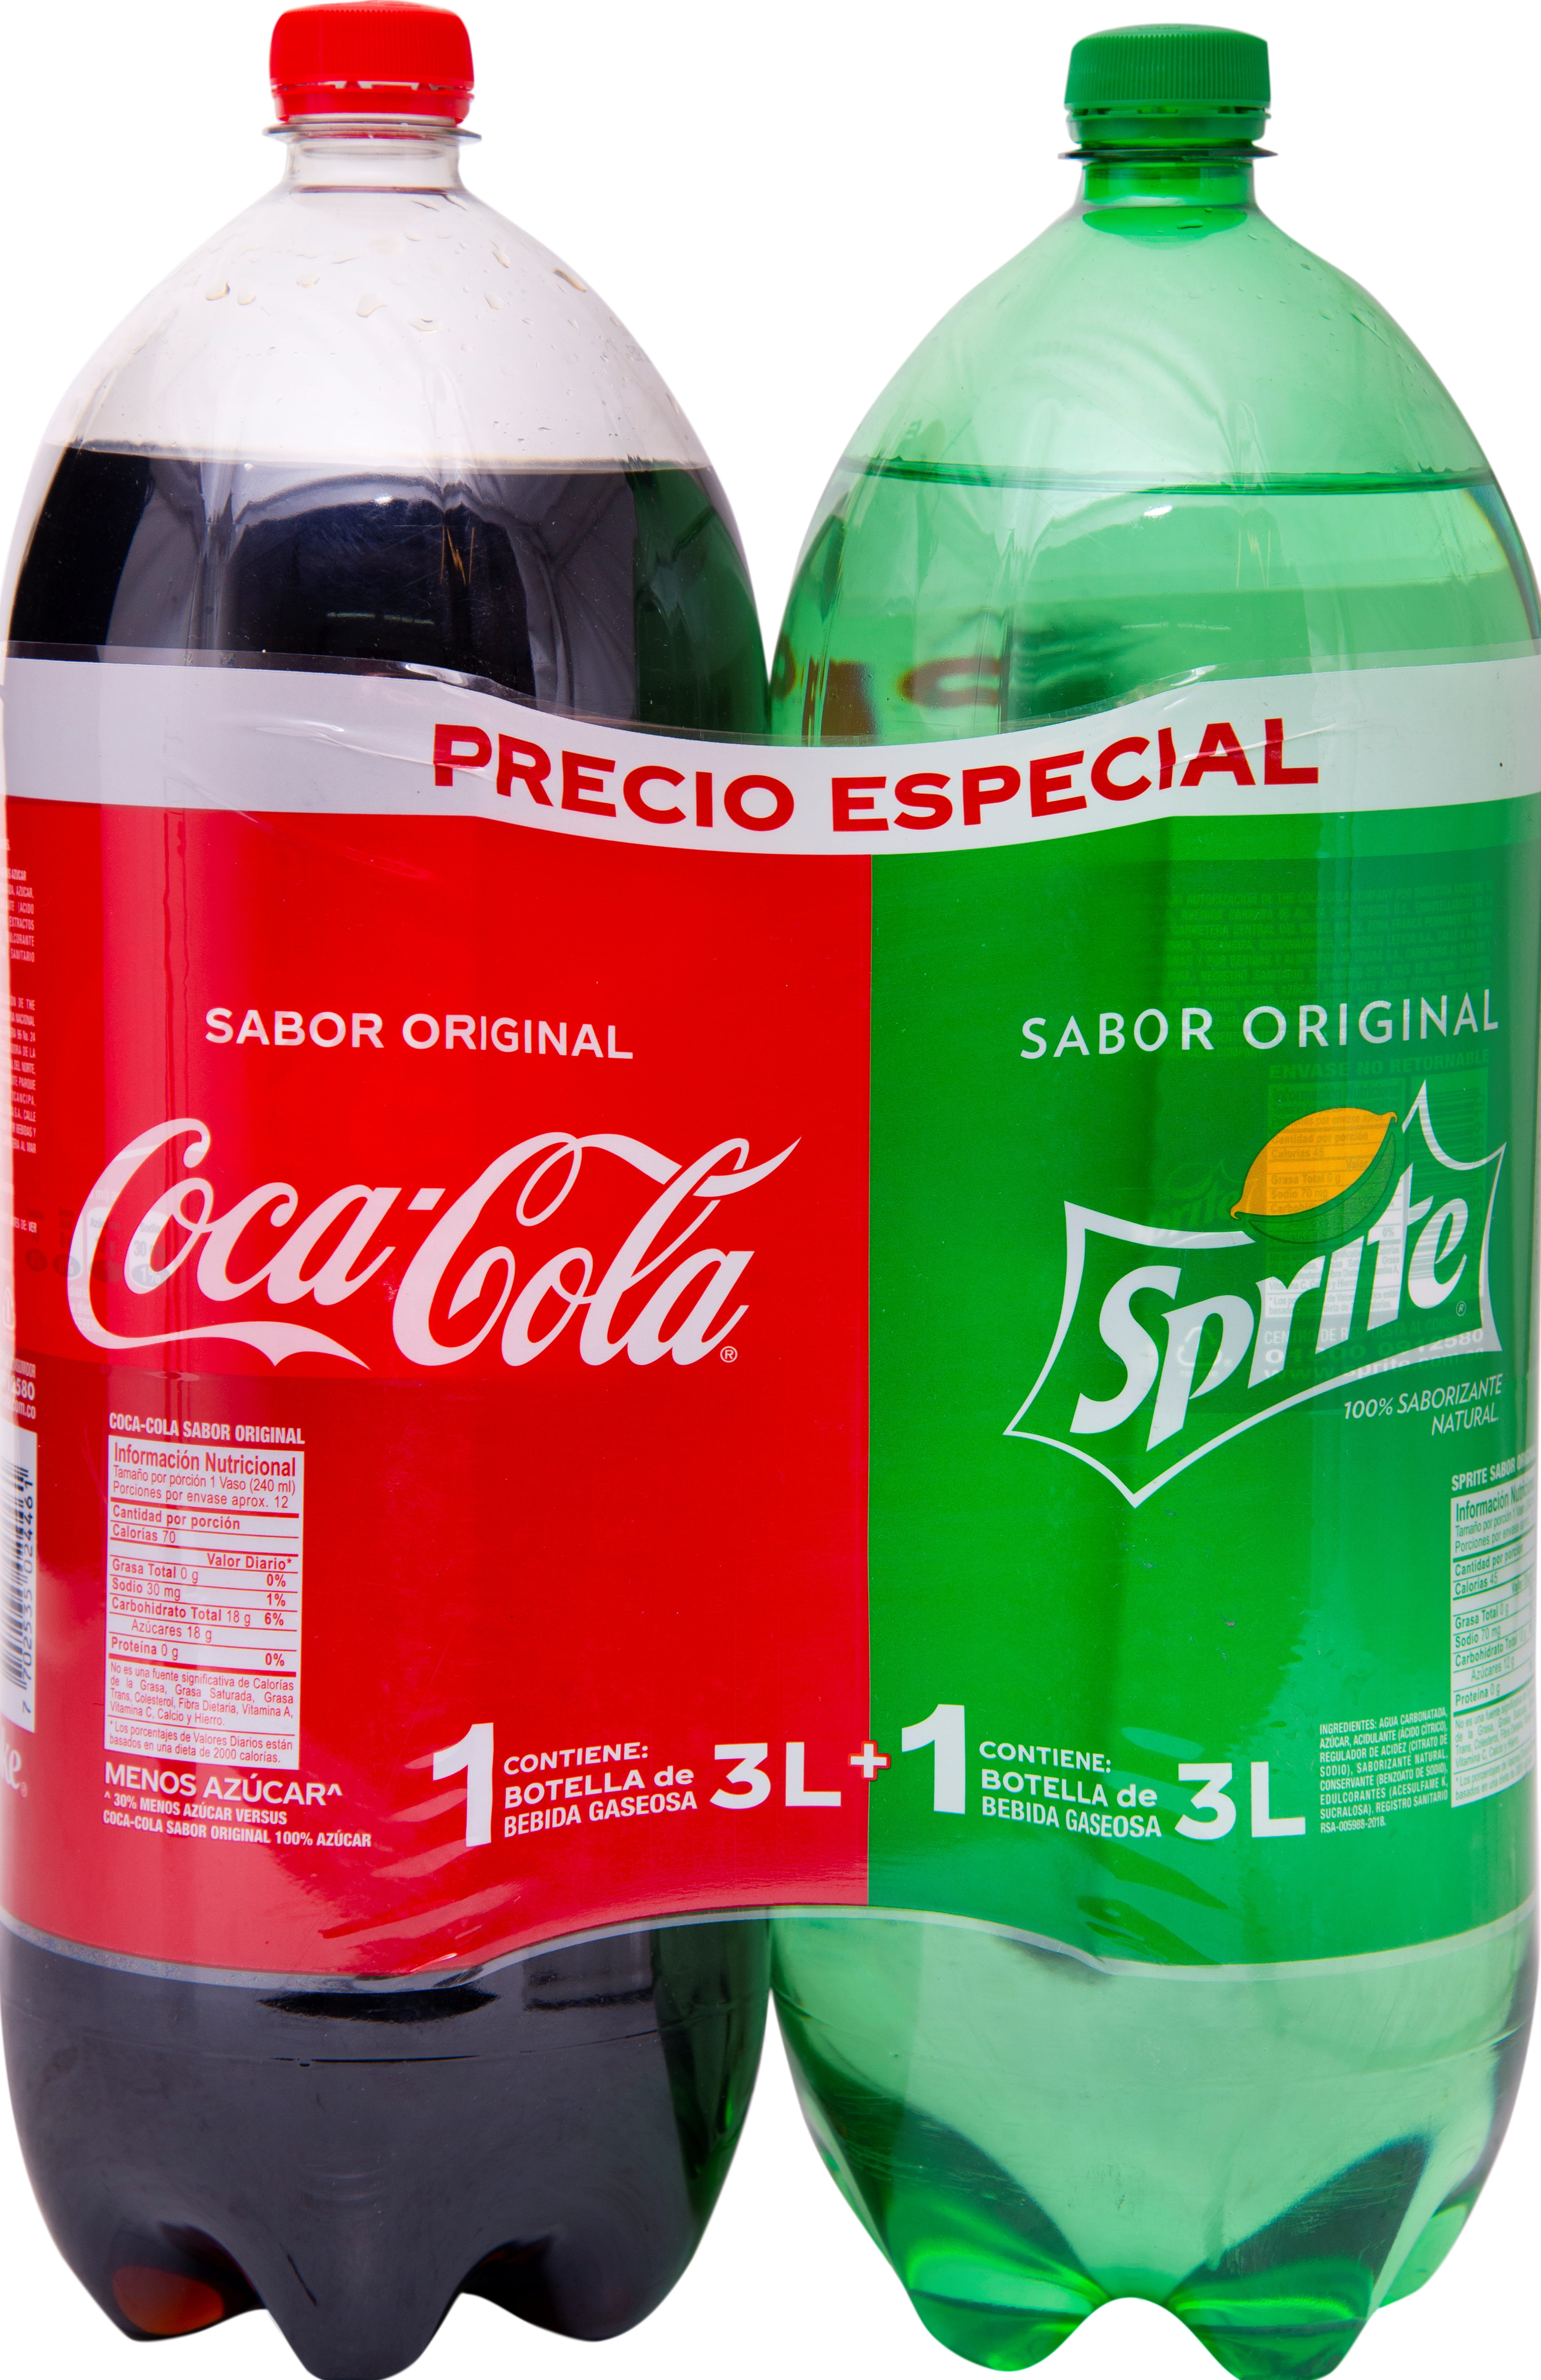 Gaseosa Cocacola Sprite 3l x2u